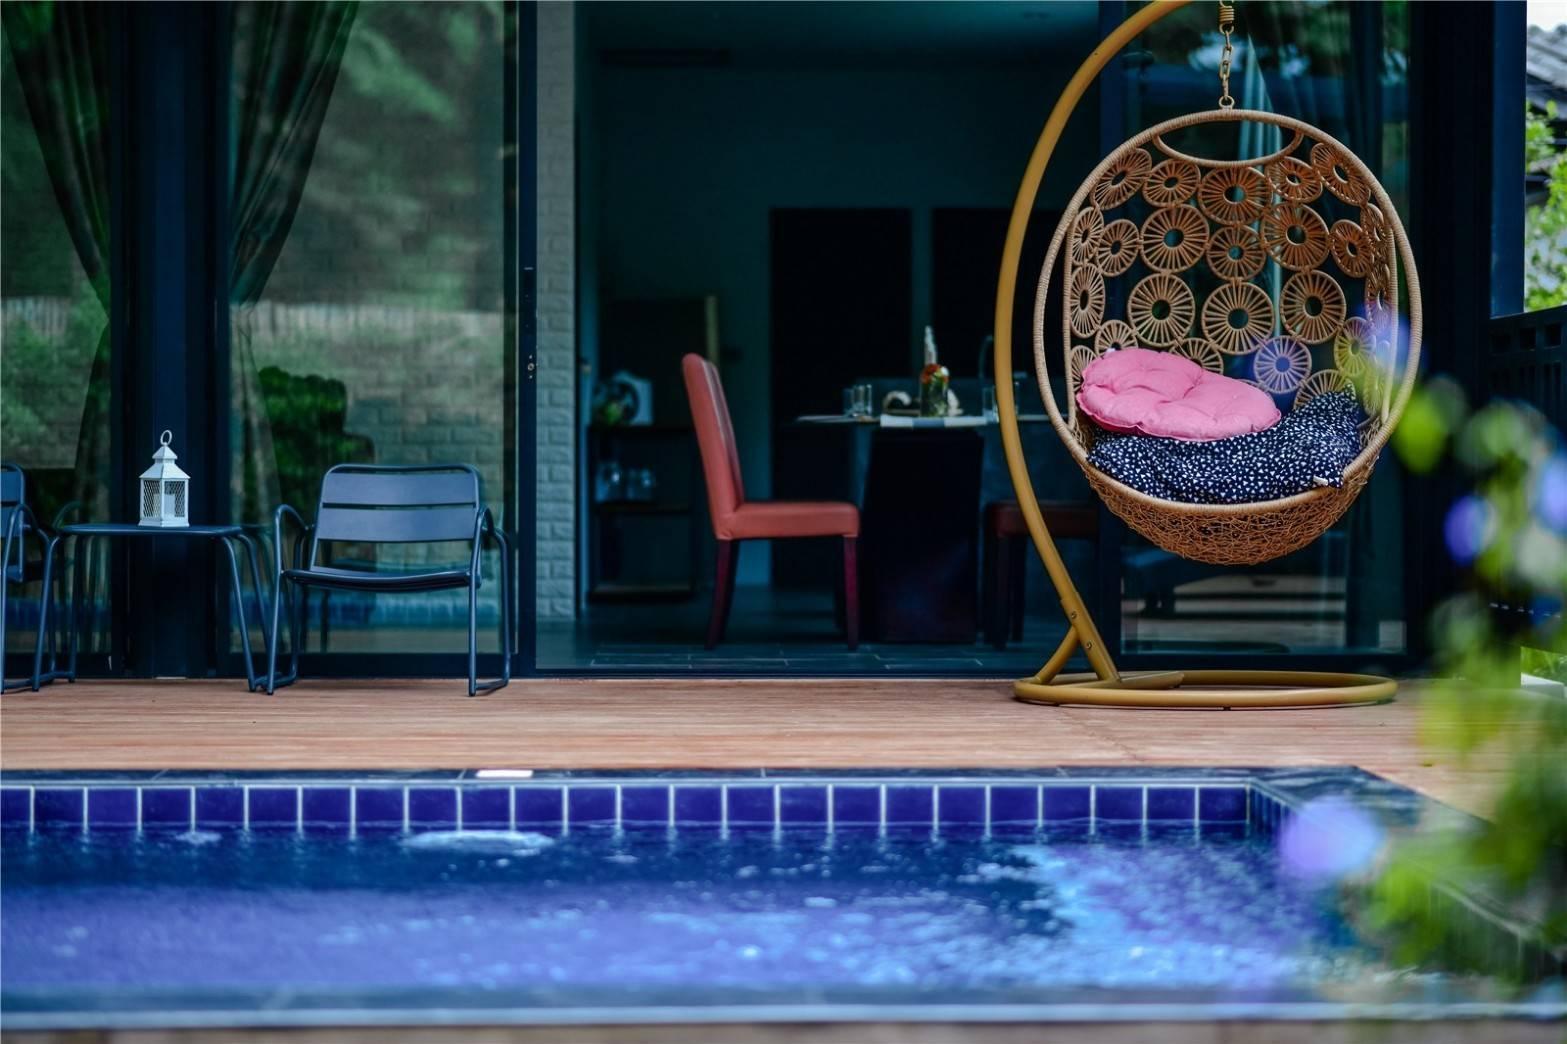 Brick Box Pool Villa วิลลา 1 ห้องนอน 1 ห้องน้ำส่วนตัว ขนาด 200 ตร.ม. – ดอยสะเก็ด